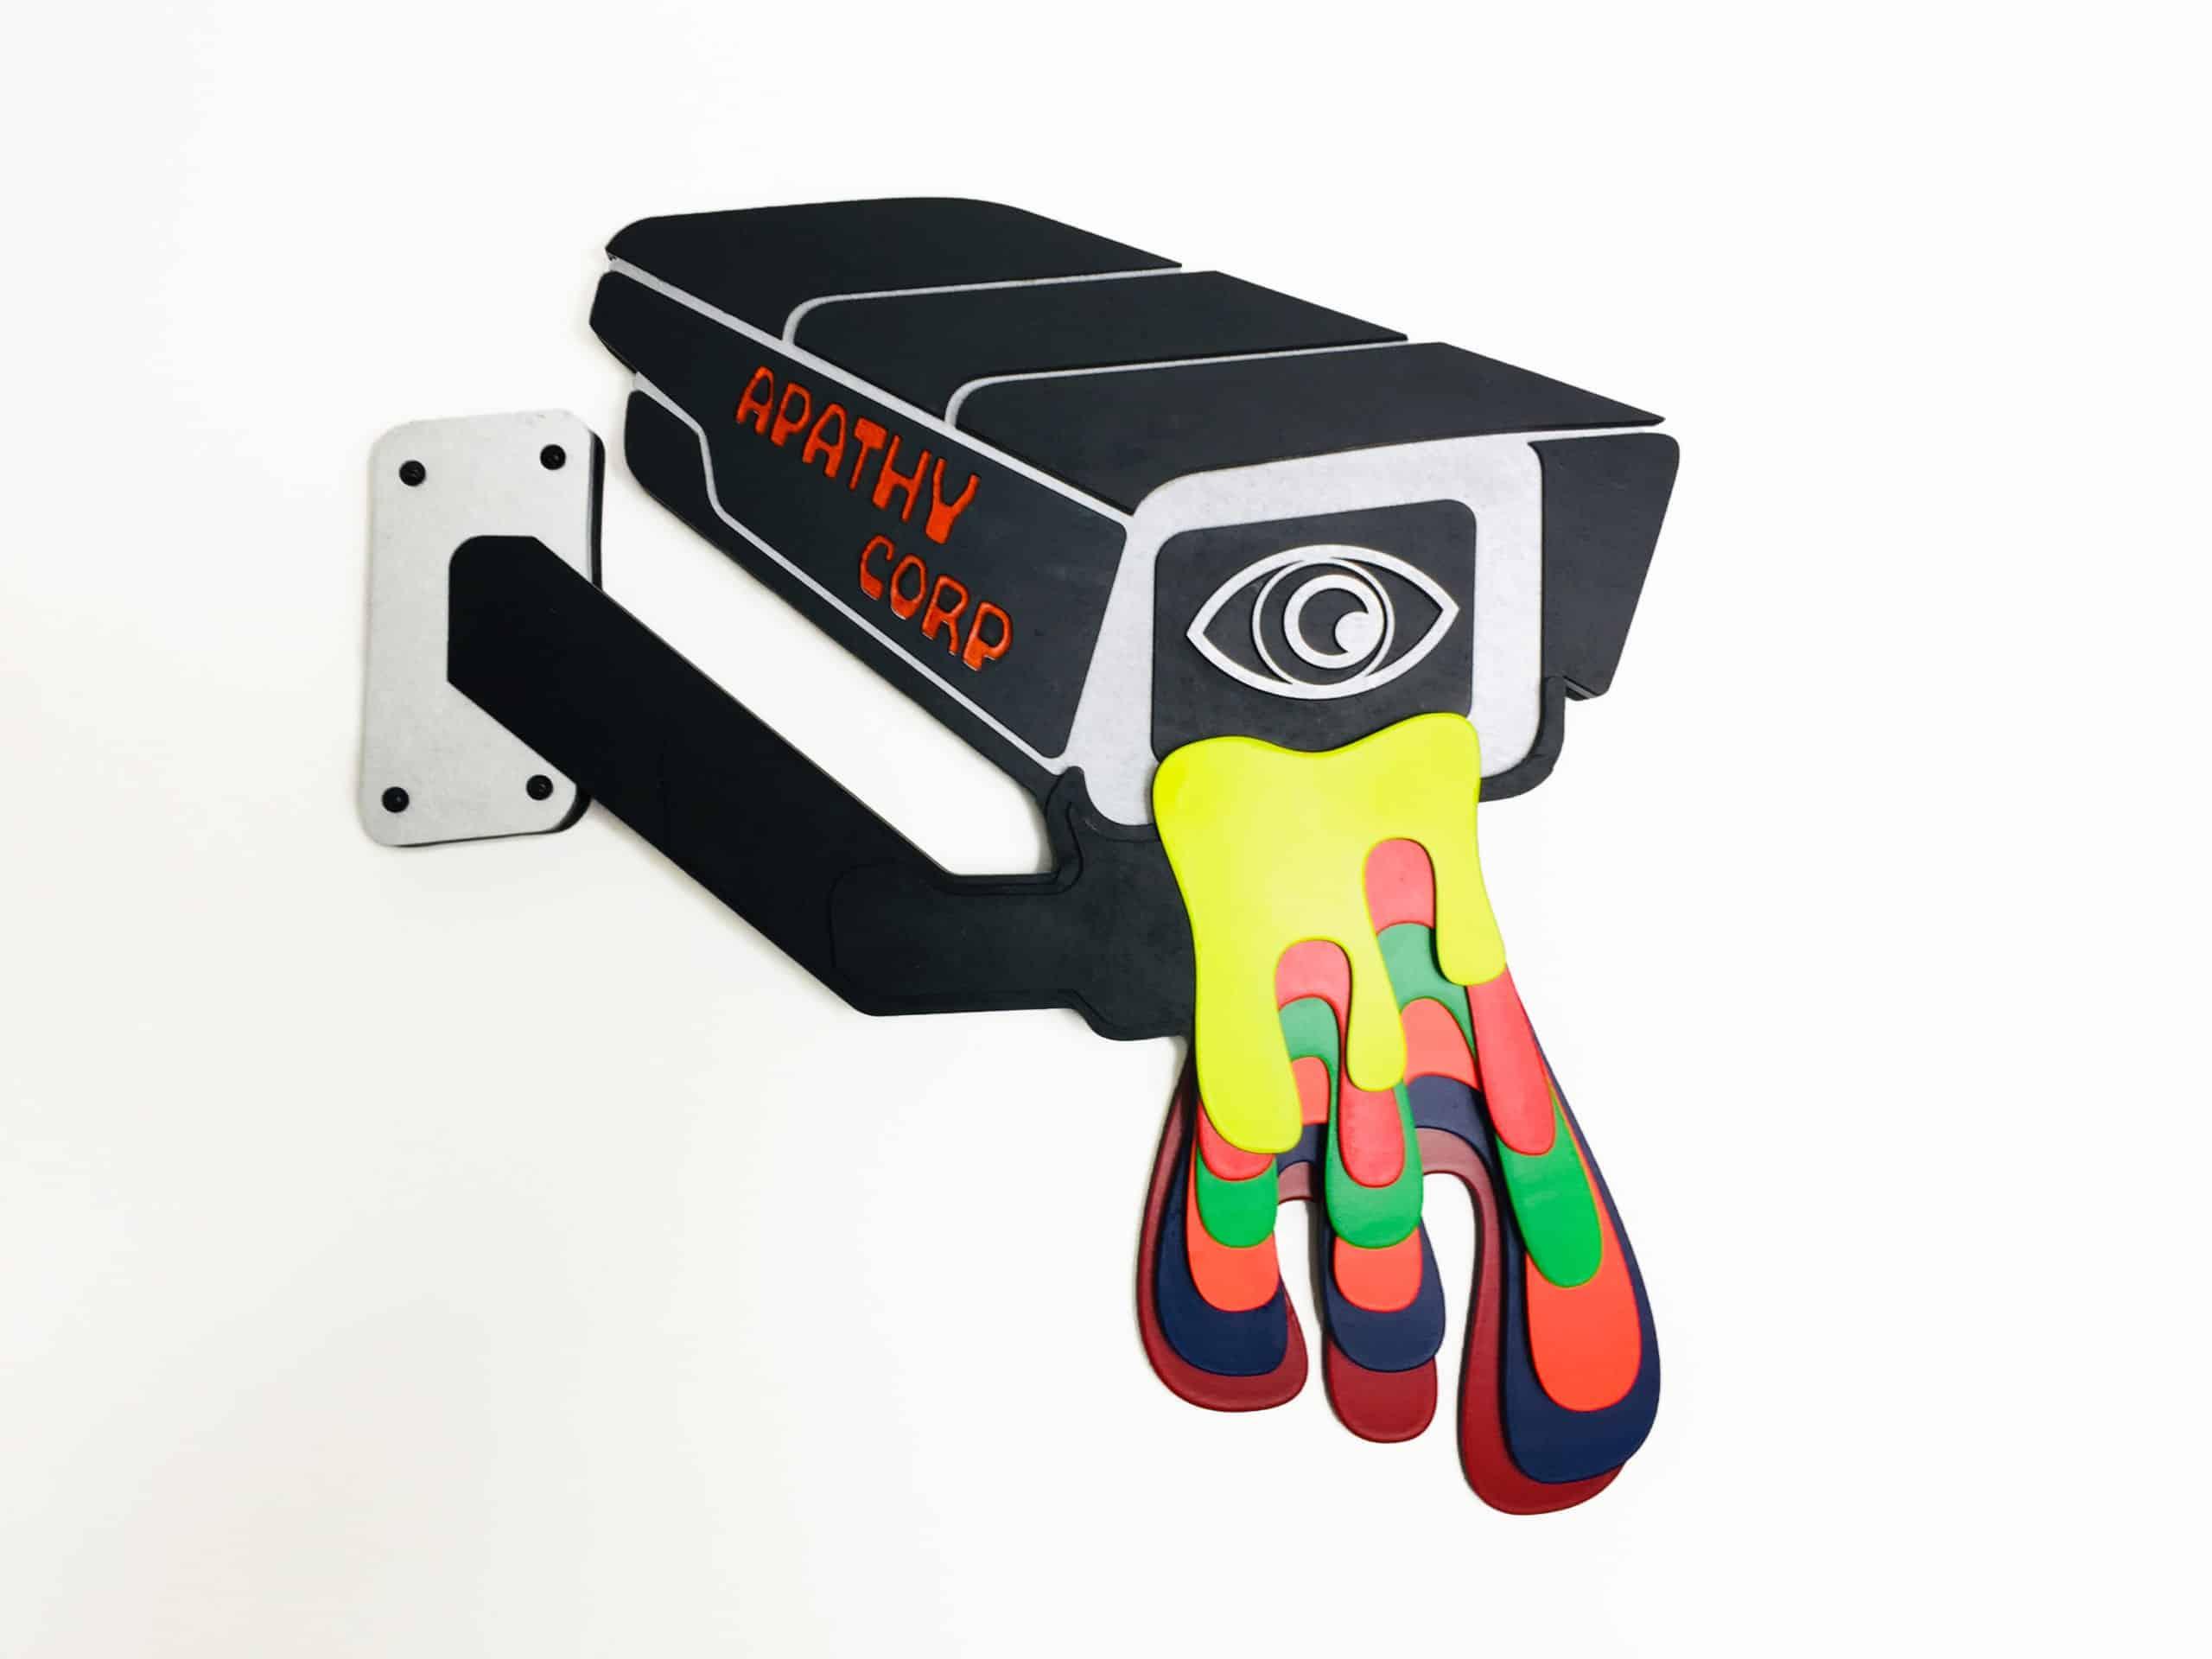 Beigeme - The Beige Regime - Laser cut cypherpunk art 1